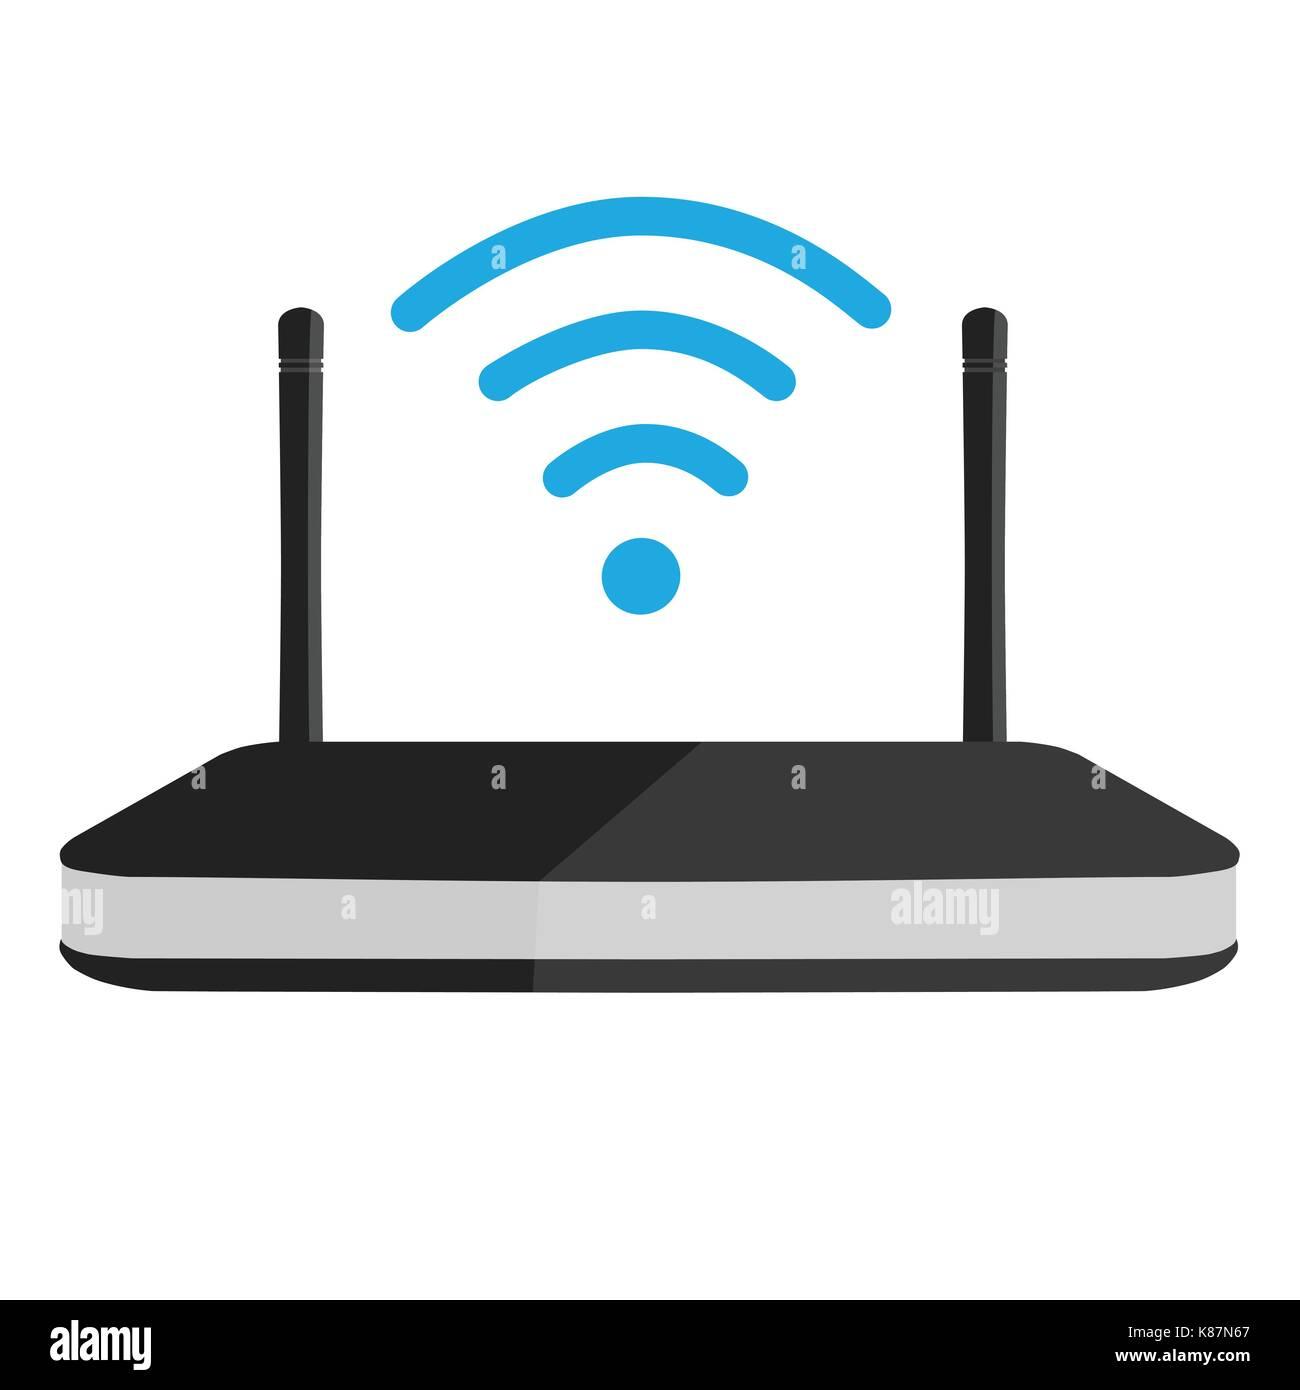 Vector Illustration Wlan Router Symbol. Wi-Fi-Symbol Vektor ...